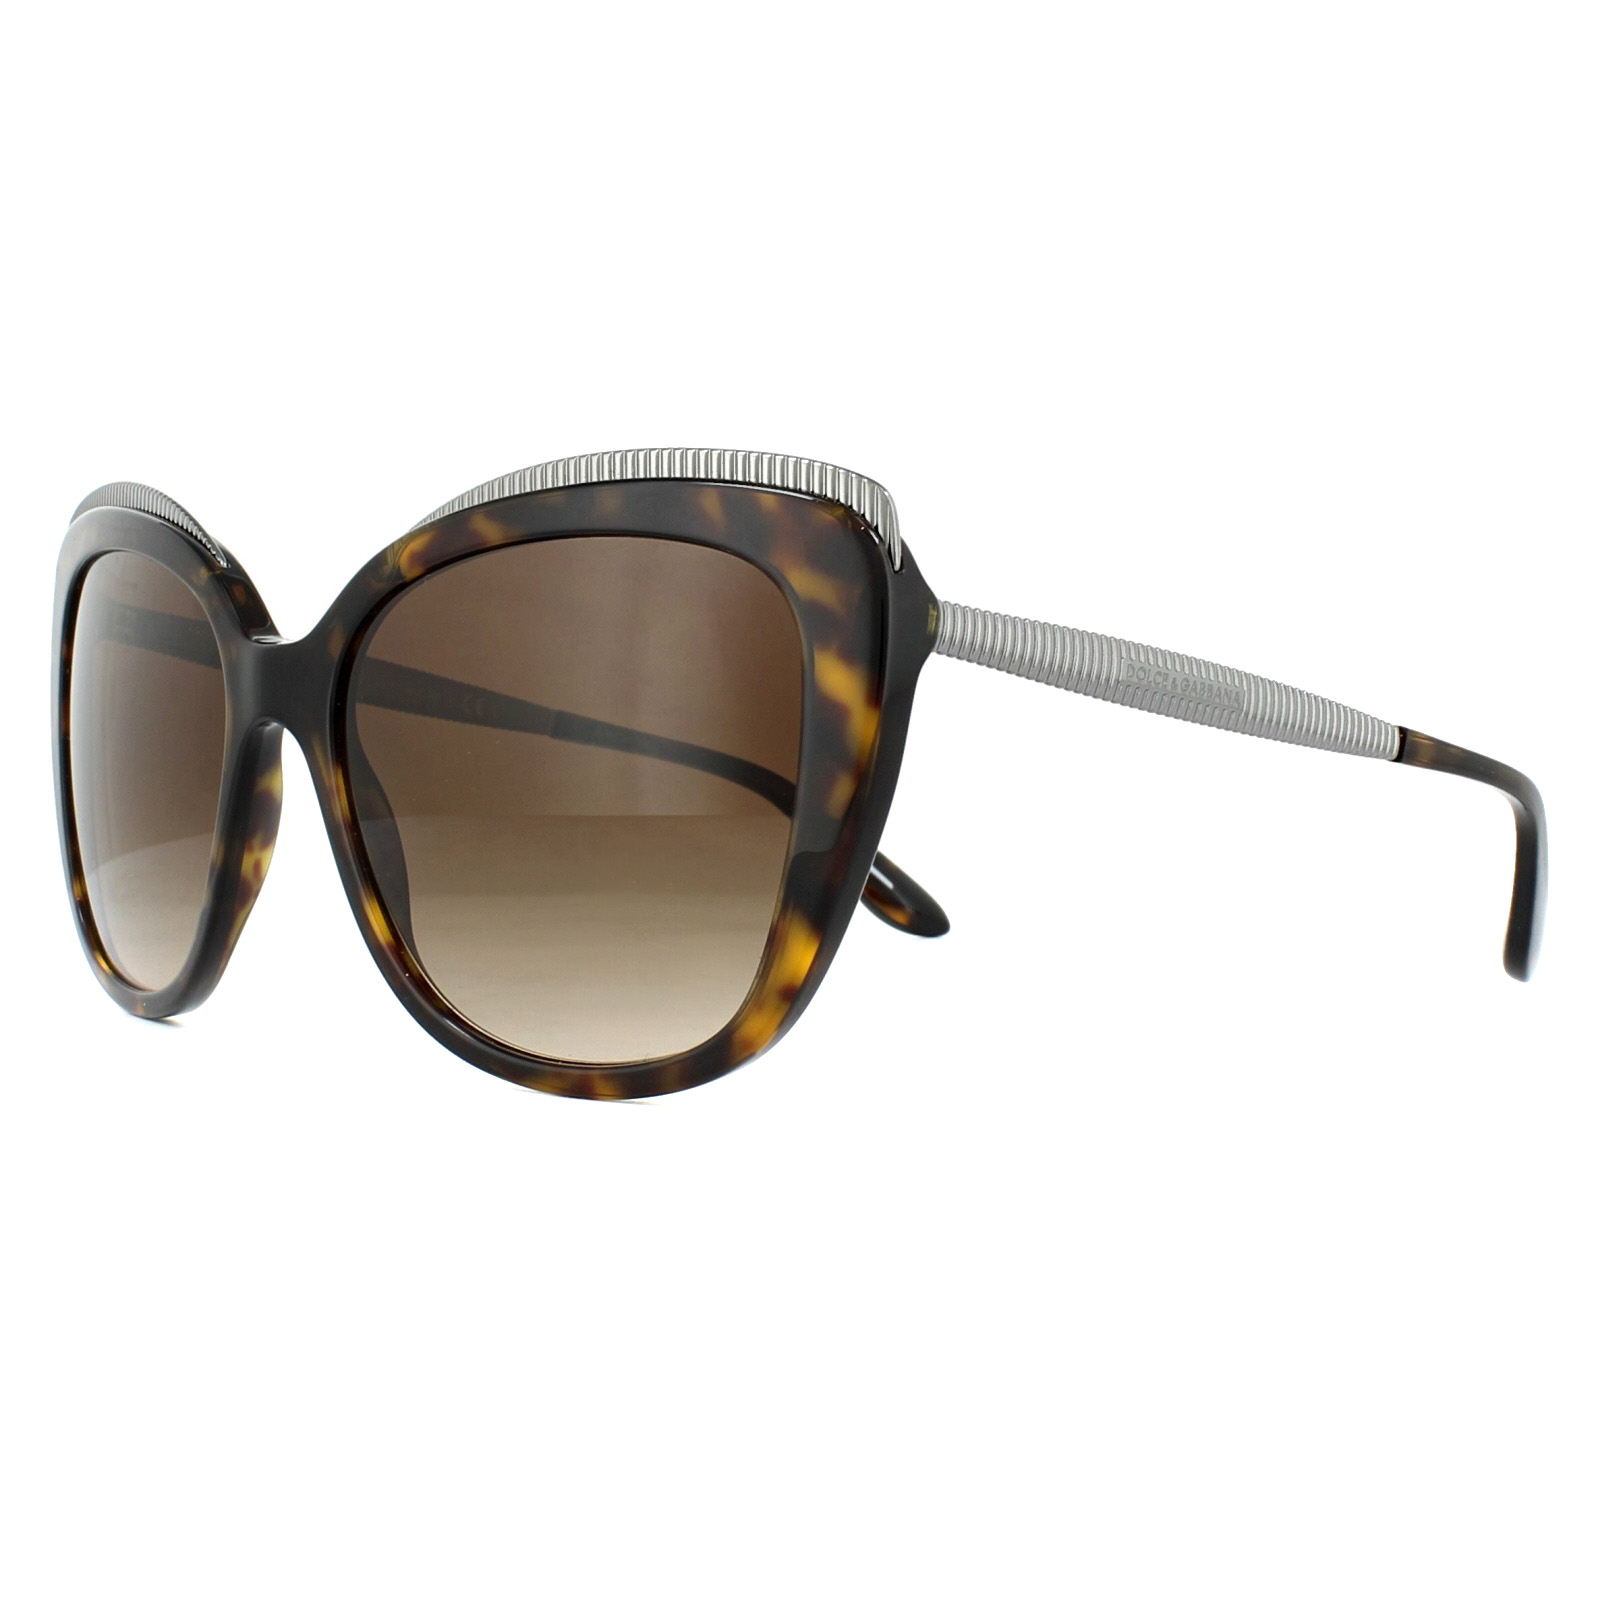 Sentinel Dolce   Gabbana Sunglasses DG4332 502 13 Havana Brown Gradient c03a245435